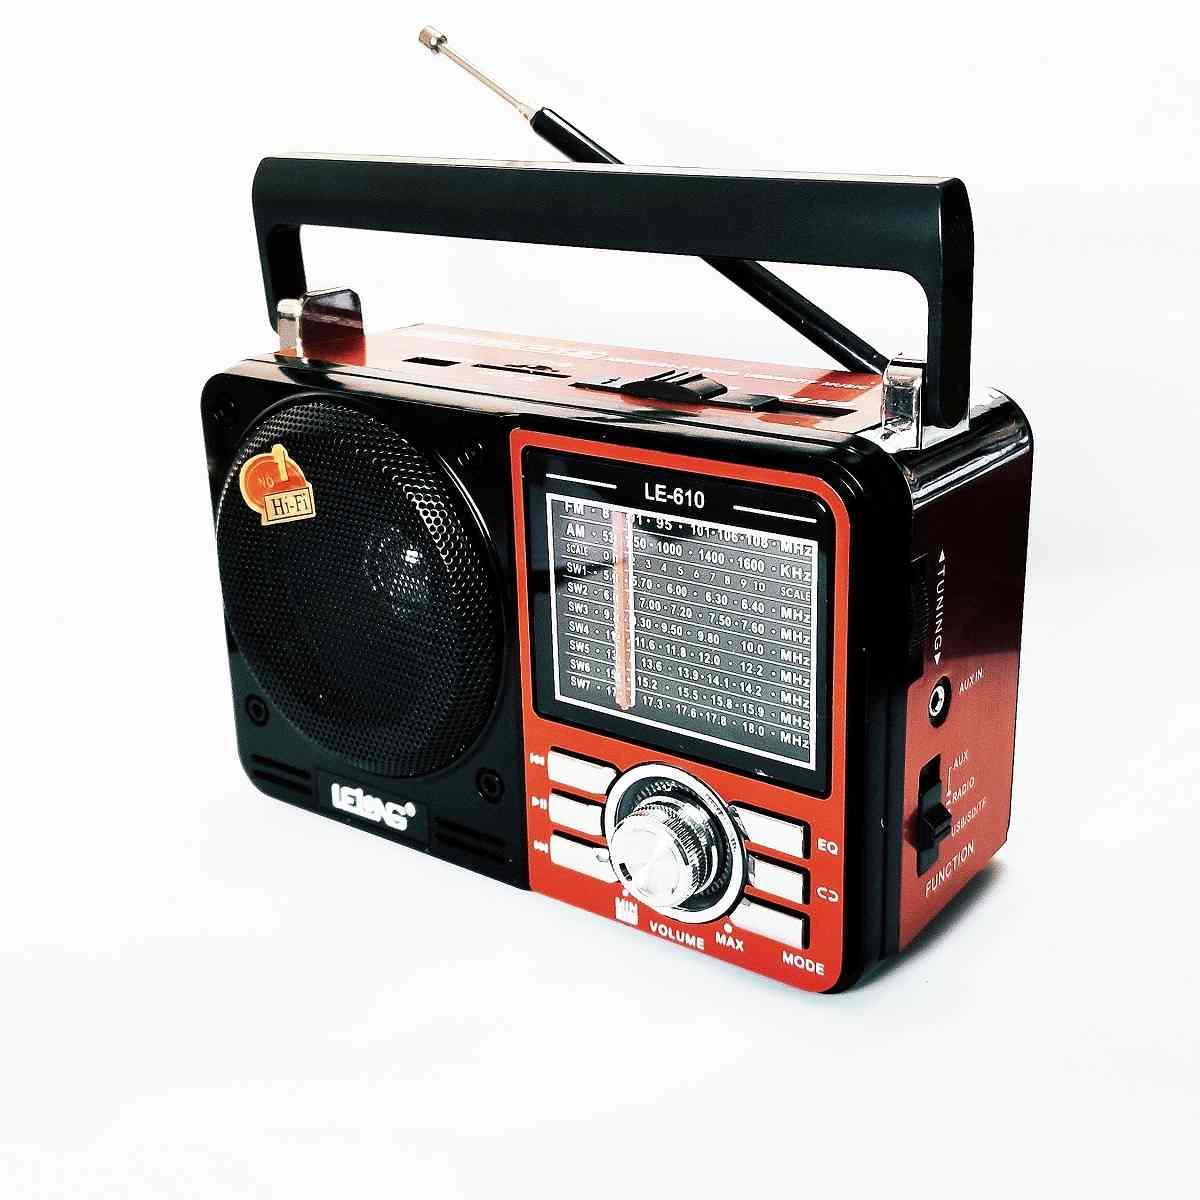 Rádio Portátil Retro Usb Sd Peandrive Am/Fm/Sw Lelong Le-610 Bivolt